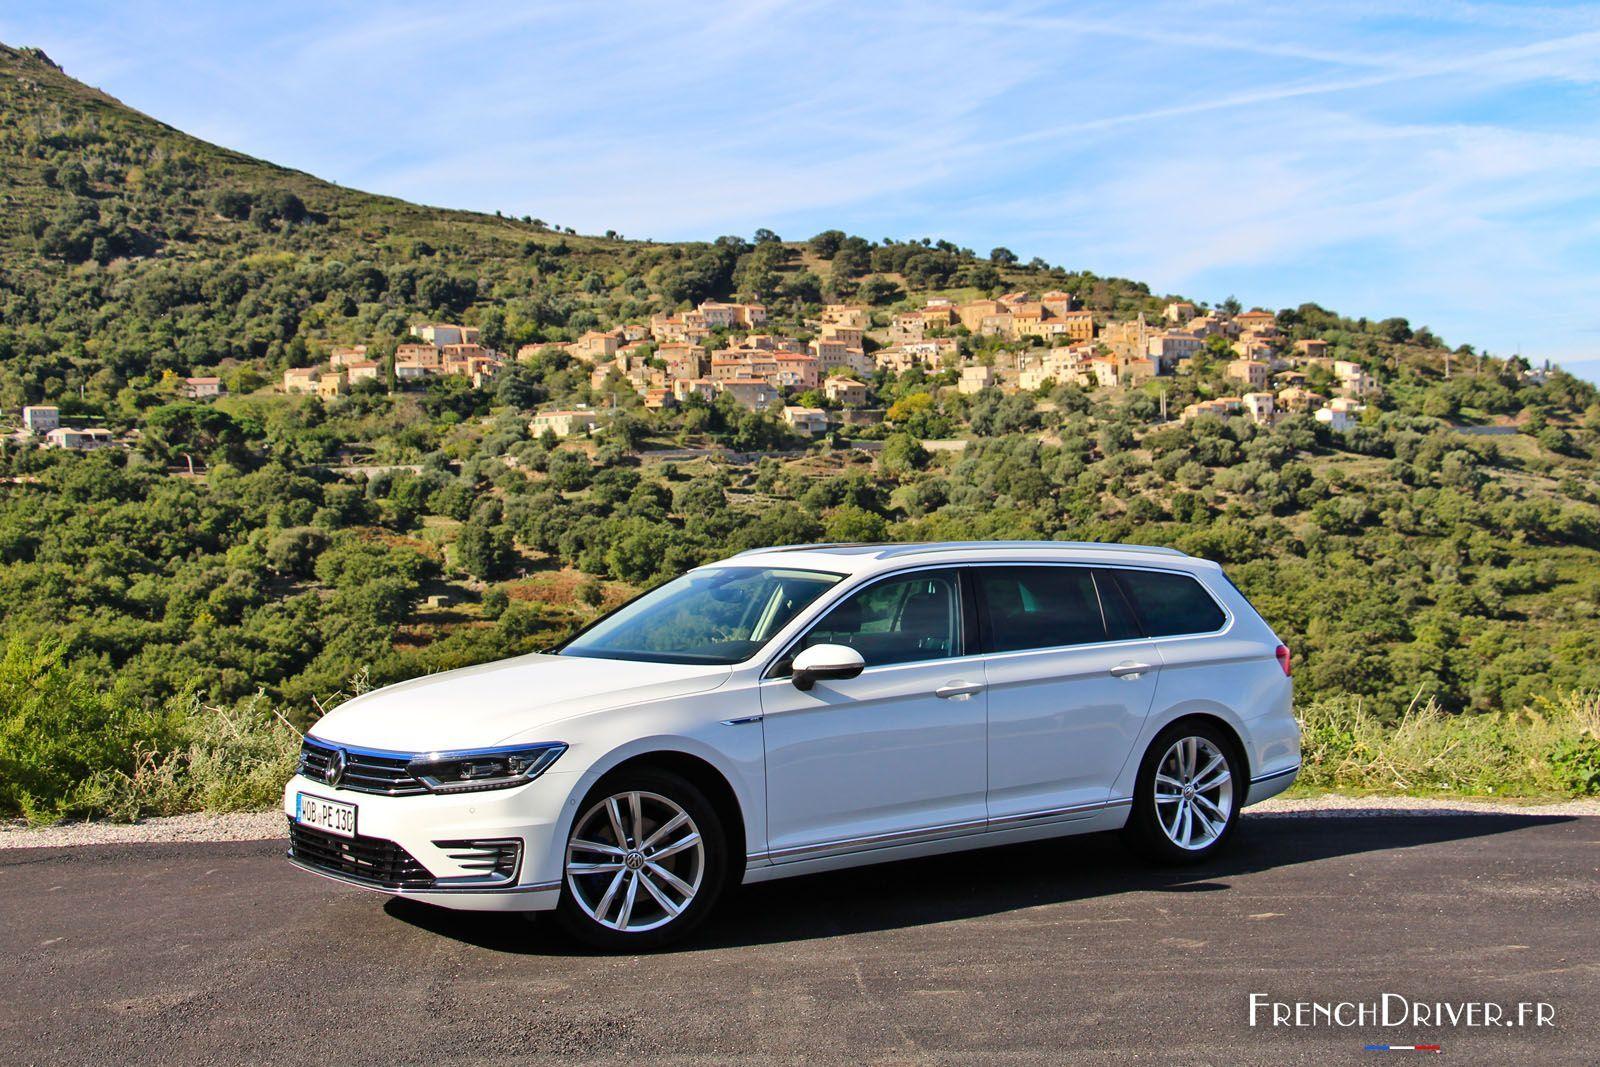 Photo Essai Volkswagen Passat Gte 2015 Volkswagenpassat